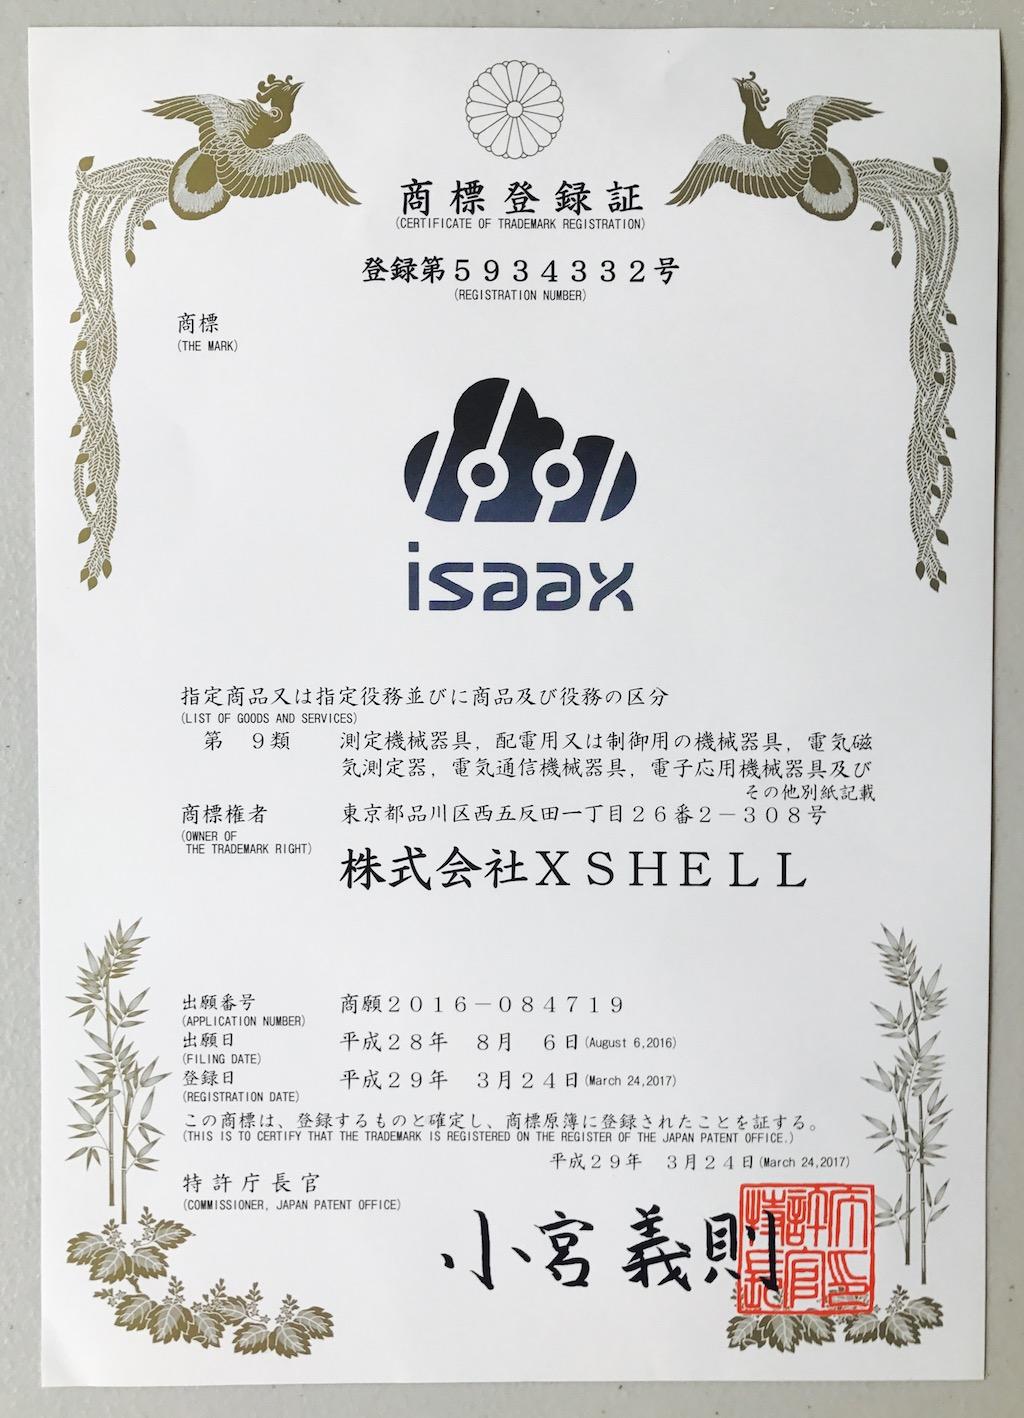 isaax商標登録証